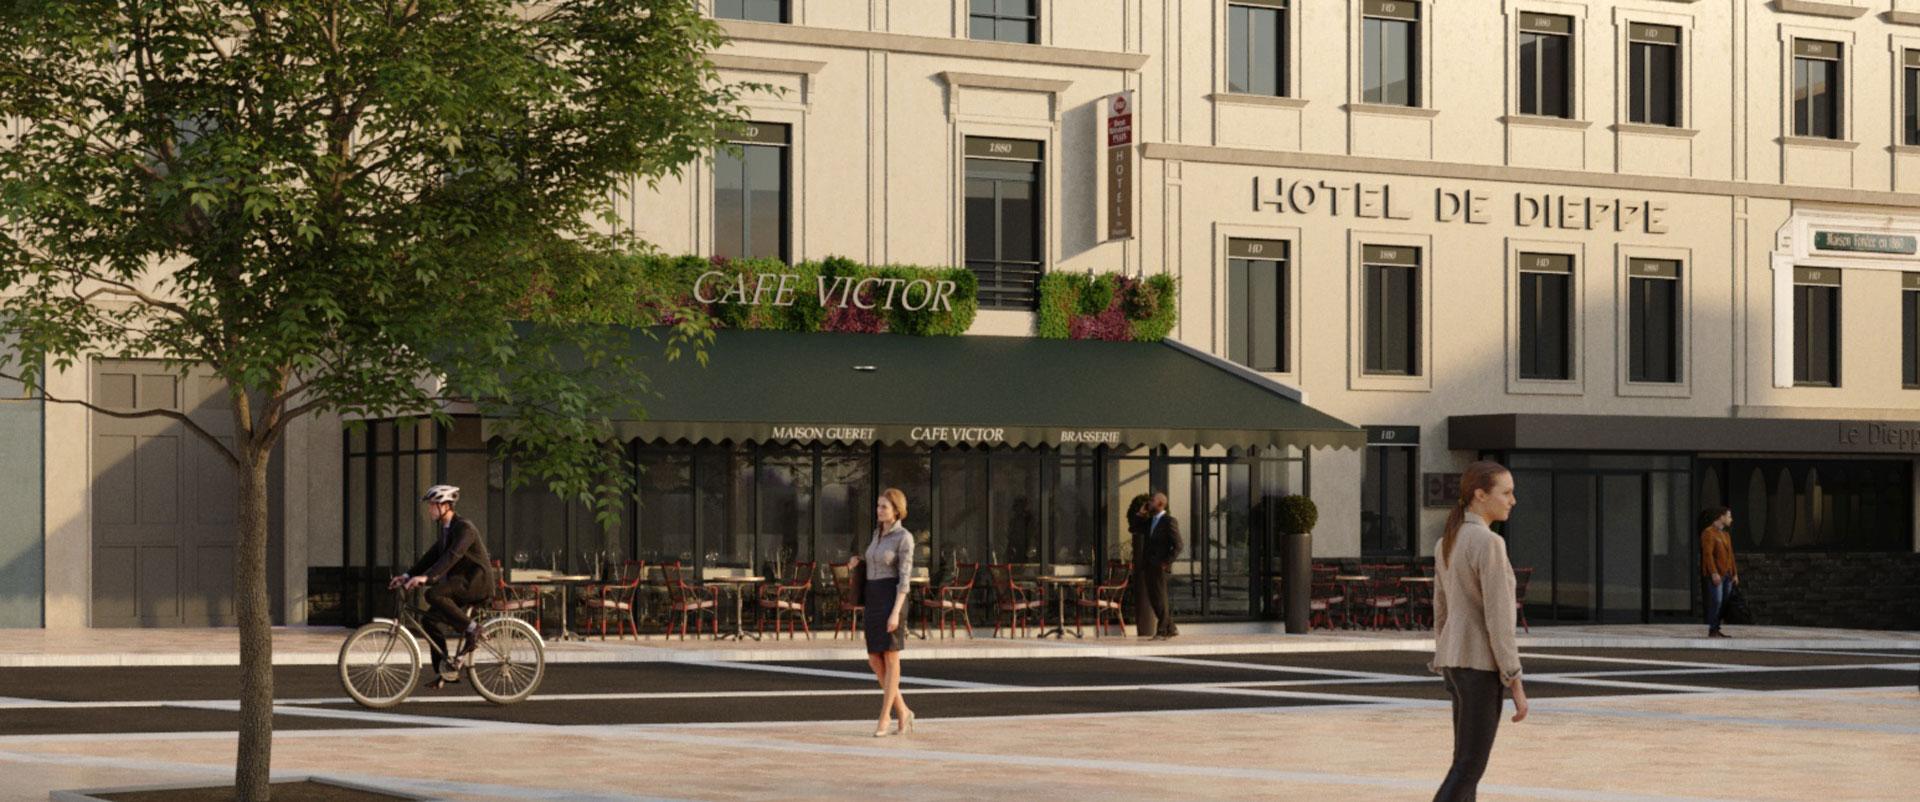 17-hotel-de-dieppe-1880-rouen-normandie-cafe-brasserie-victor-1920×801